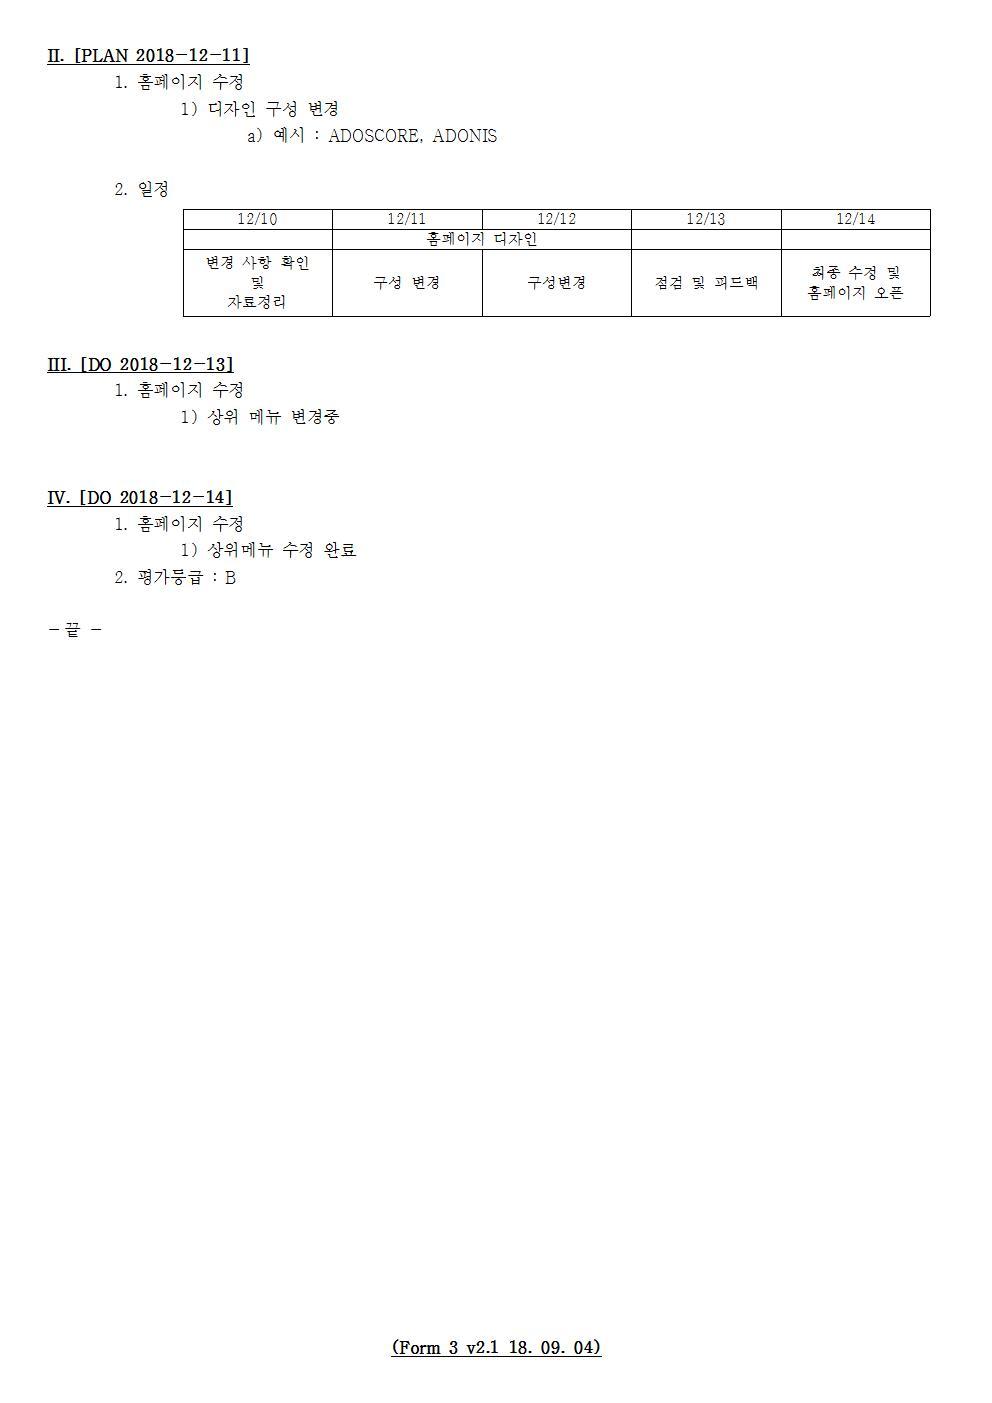 D-[18-047-BZ-07]-[BZEN HP v3.0]-[2018-12-14][HH]002.jpg